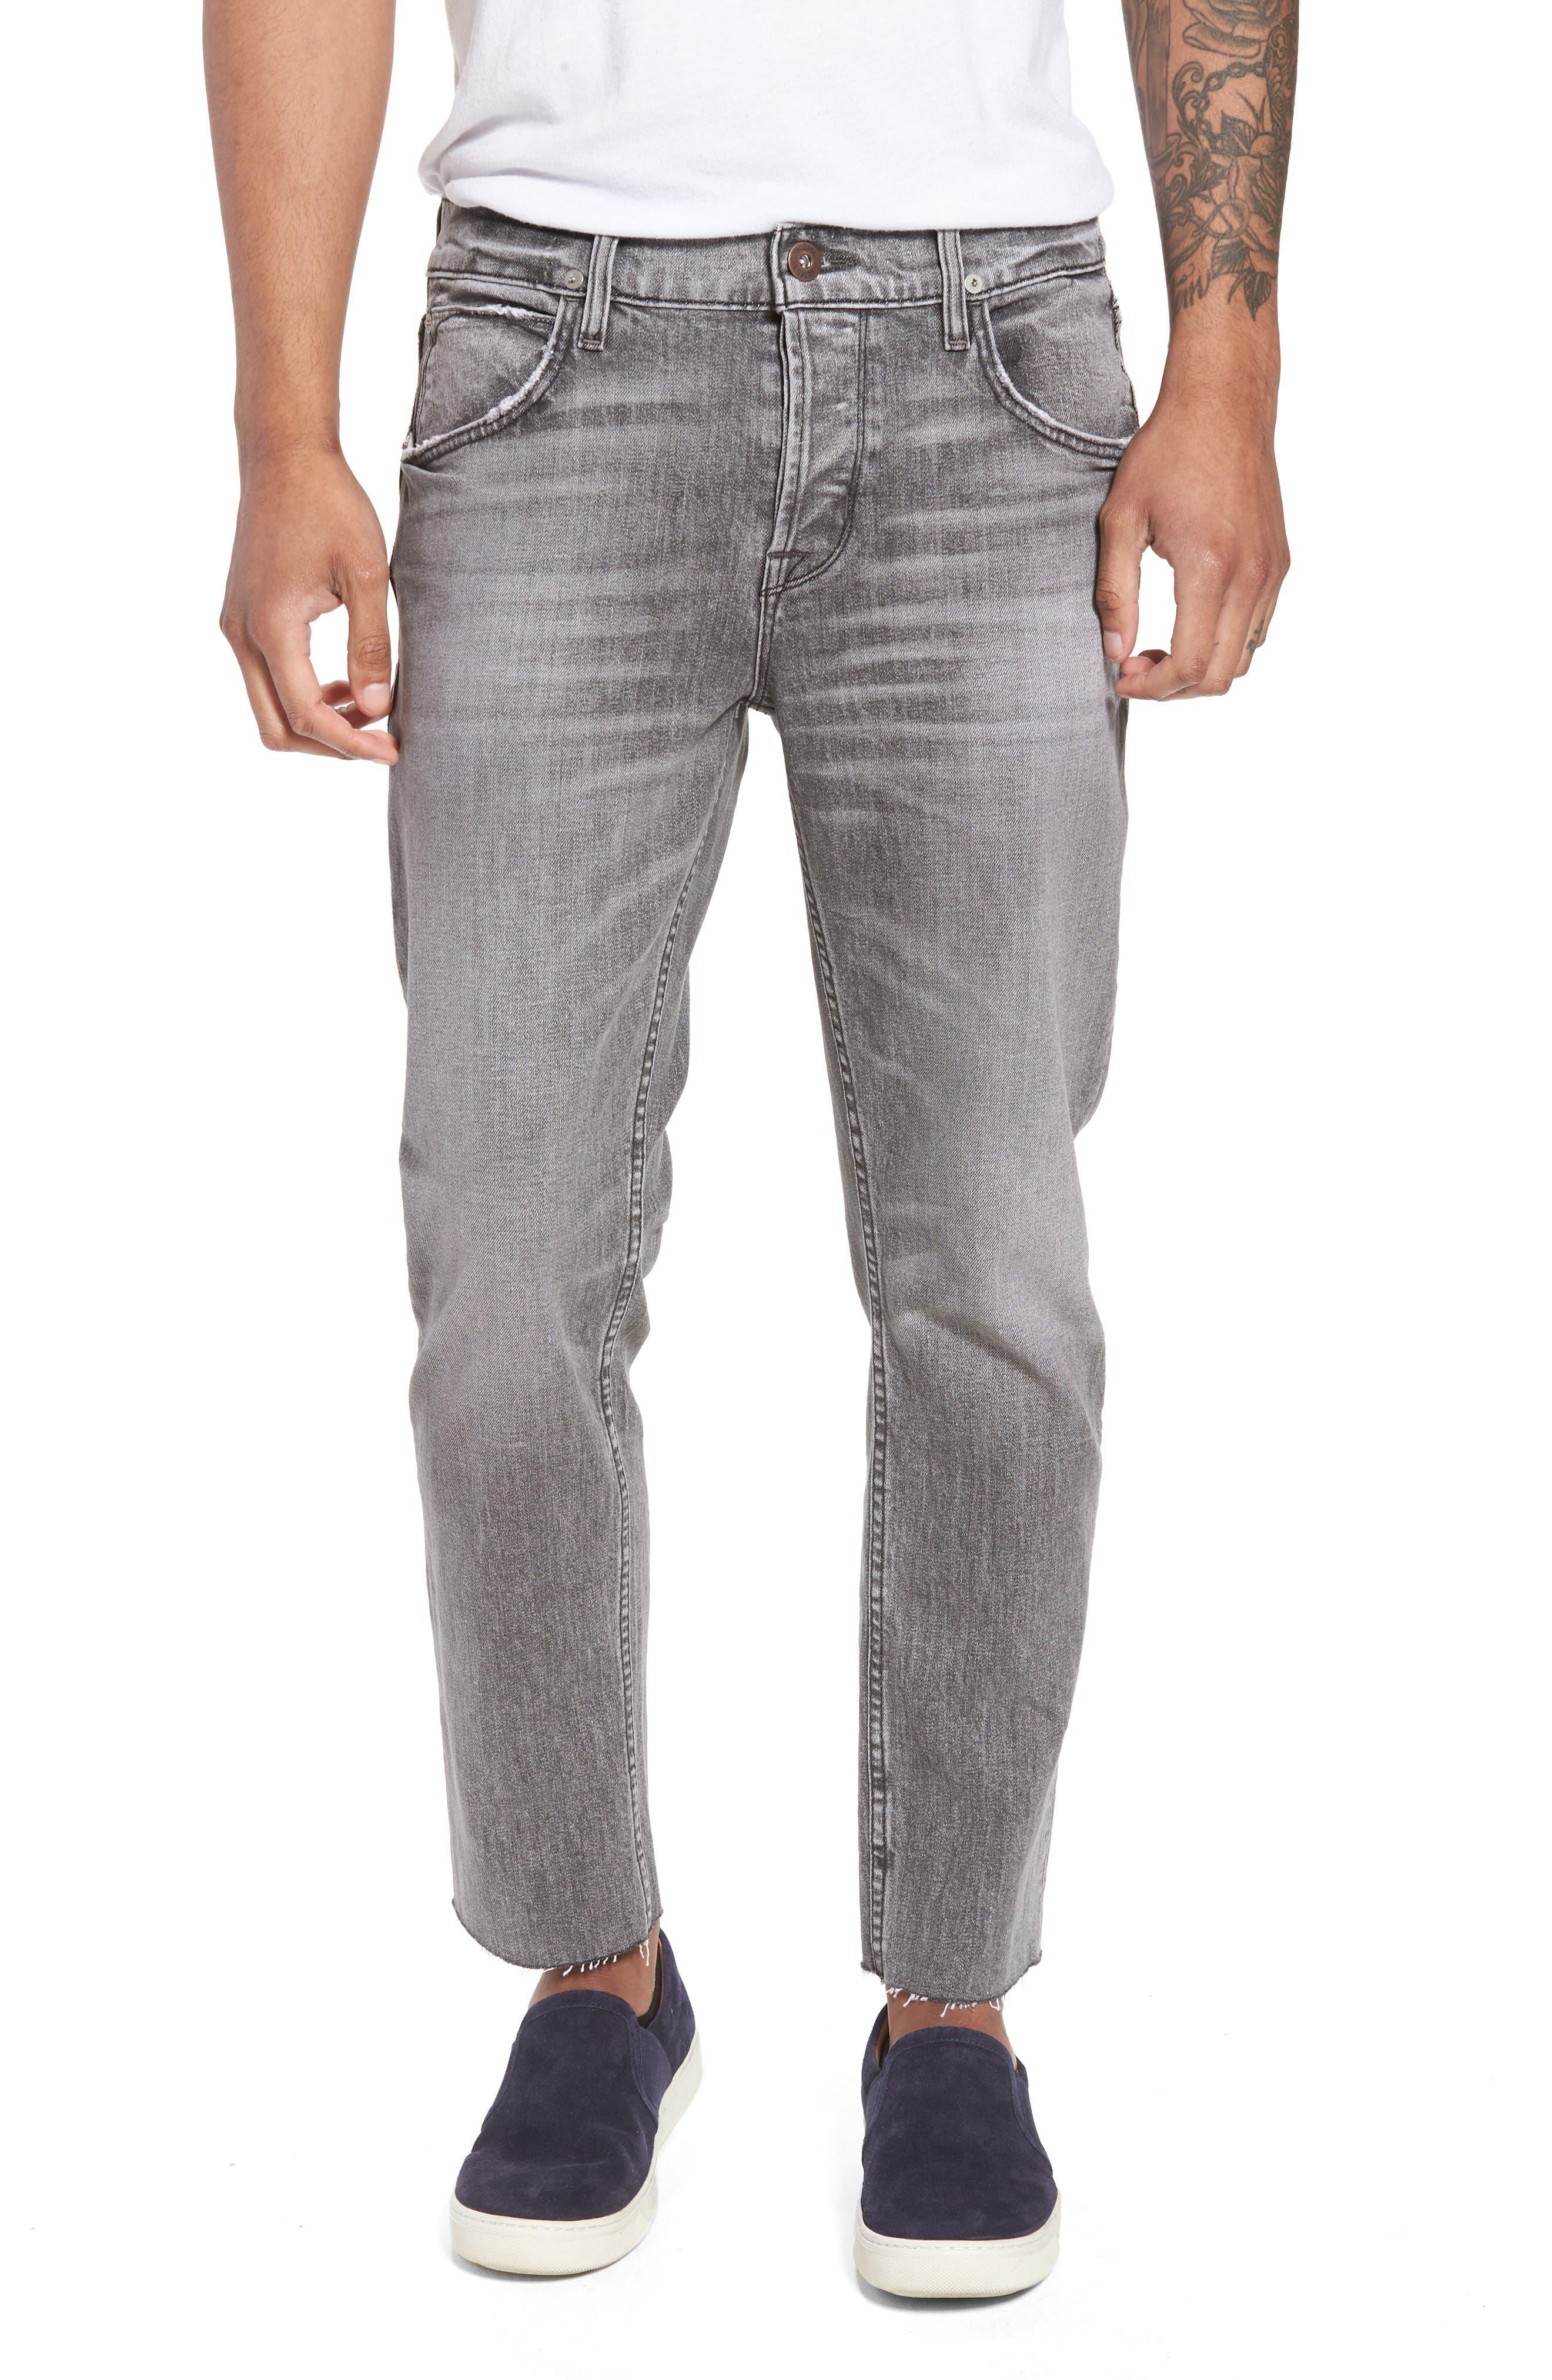 Blake Slim Fit Jeans,                             Main thumbnail 1, color,                             Chrome